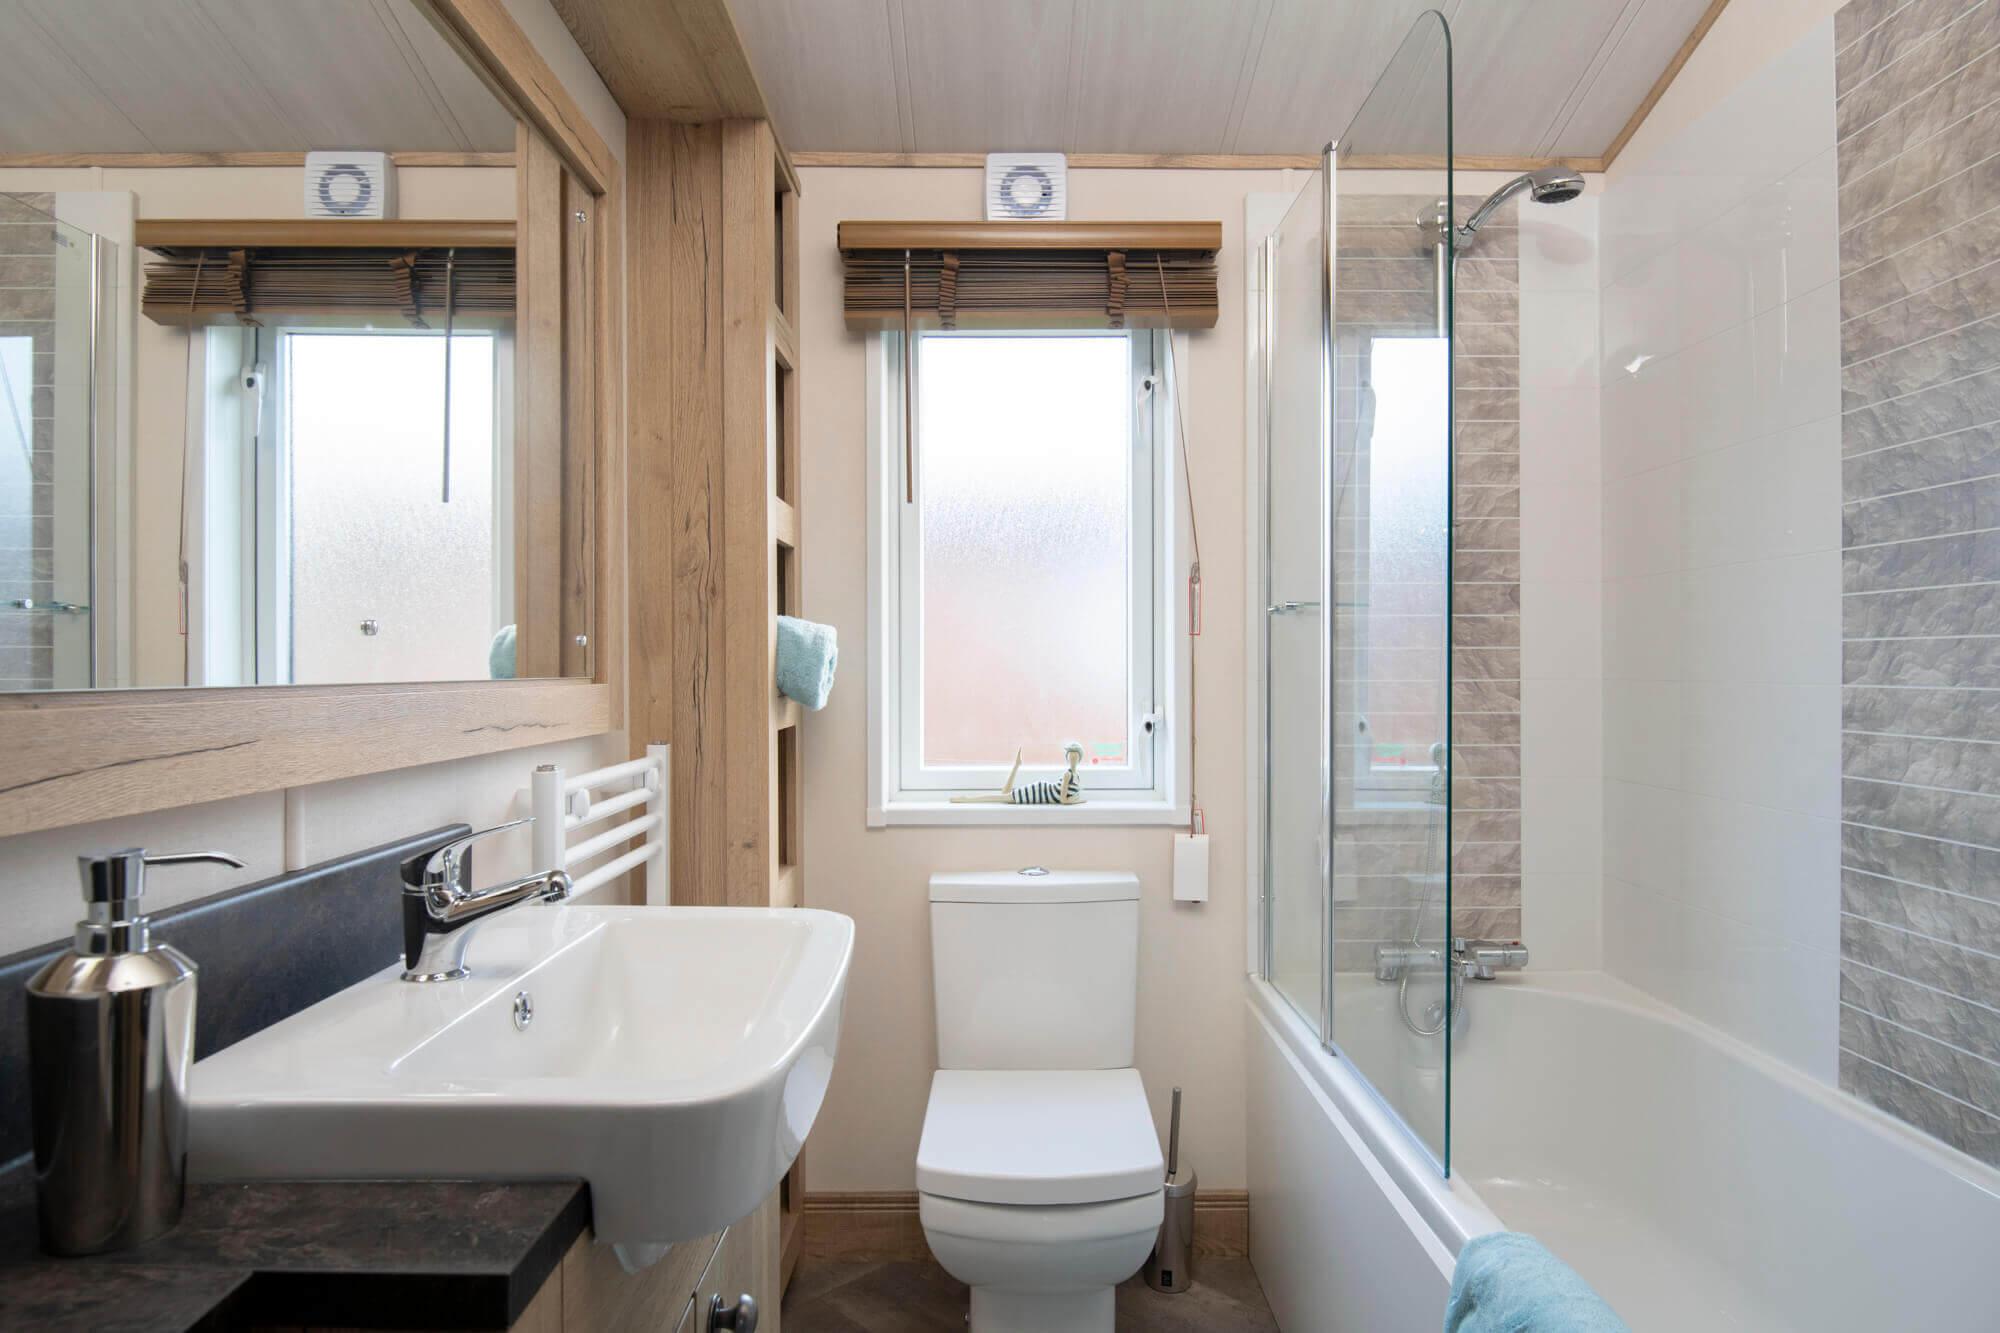 ABI Harrogate family bathroom